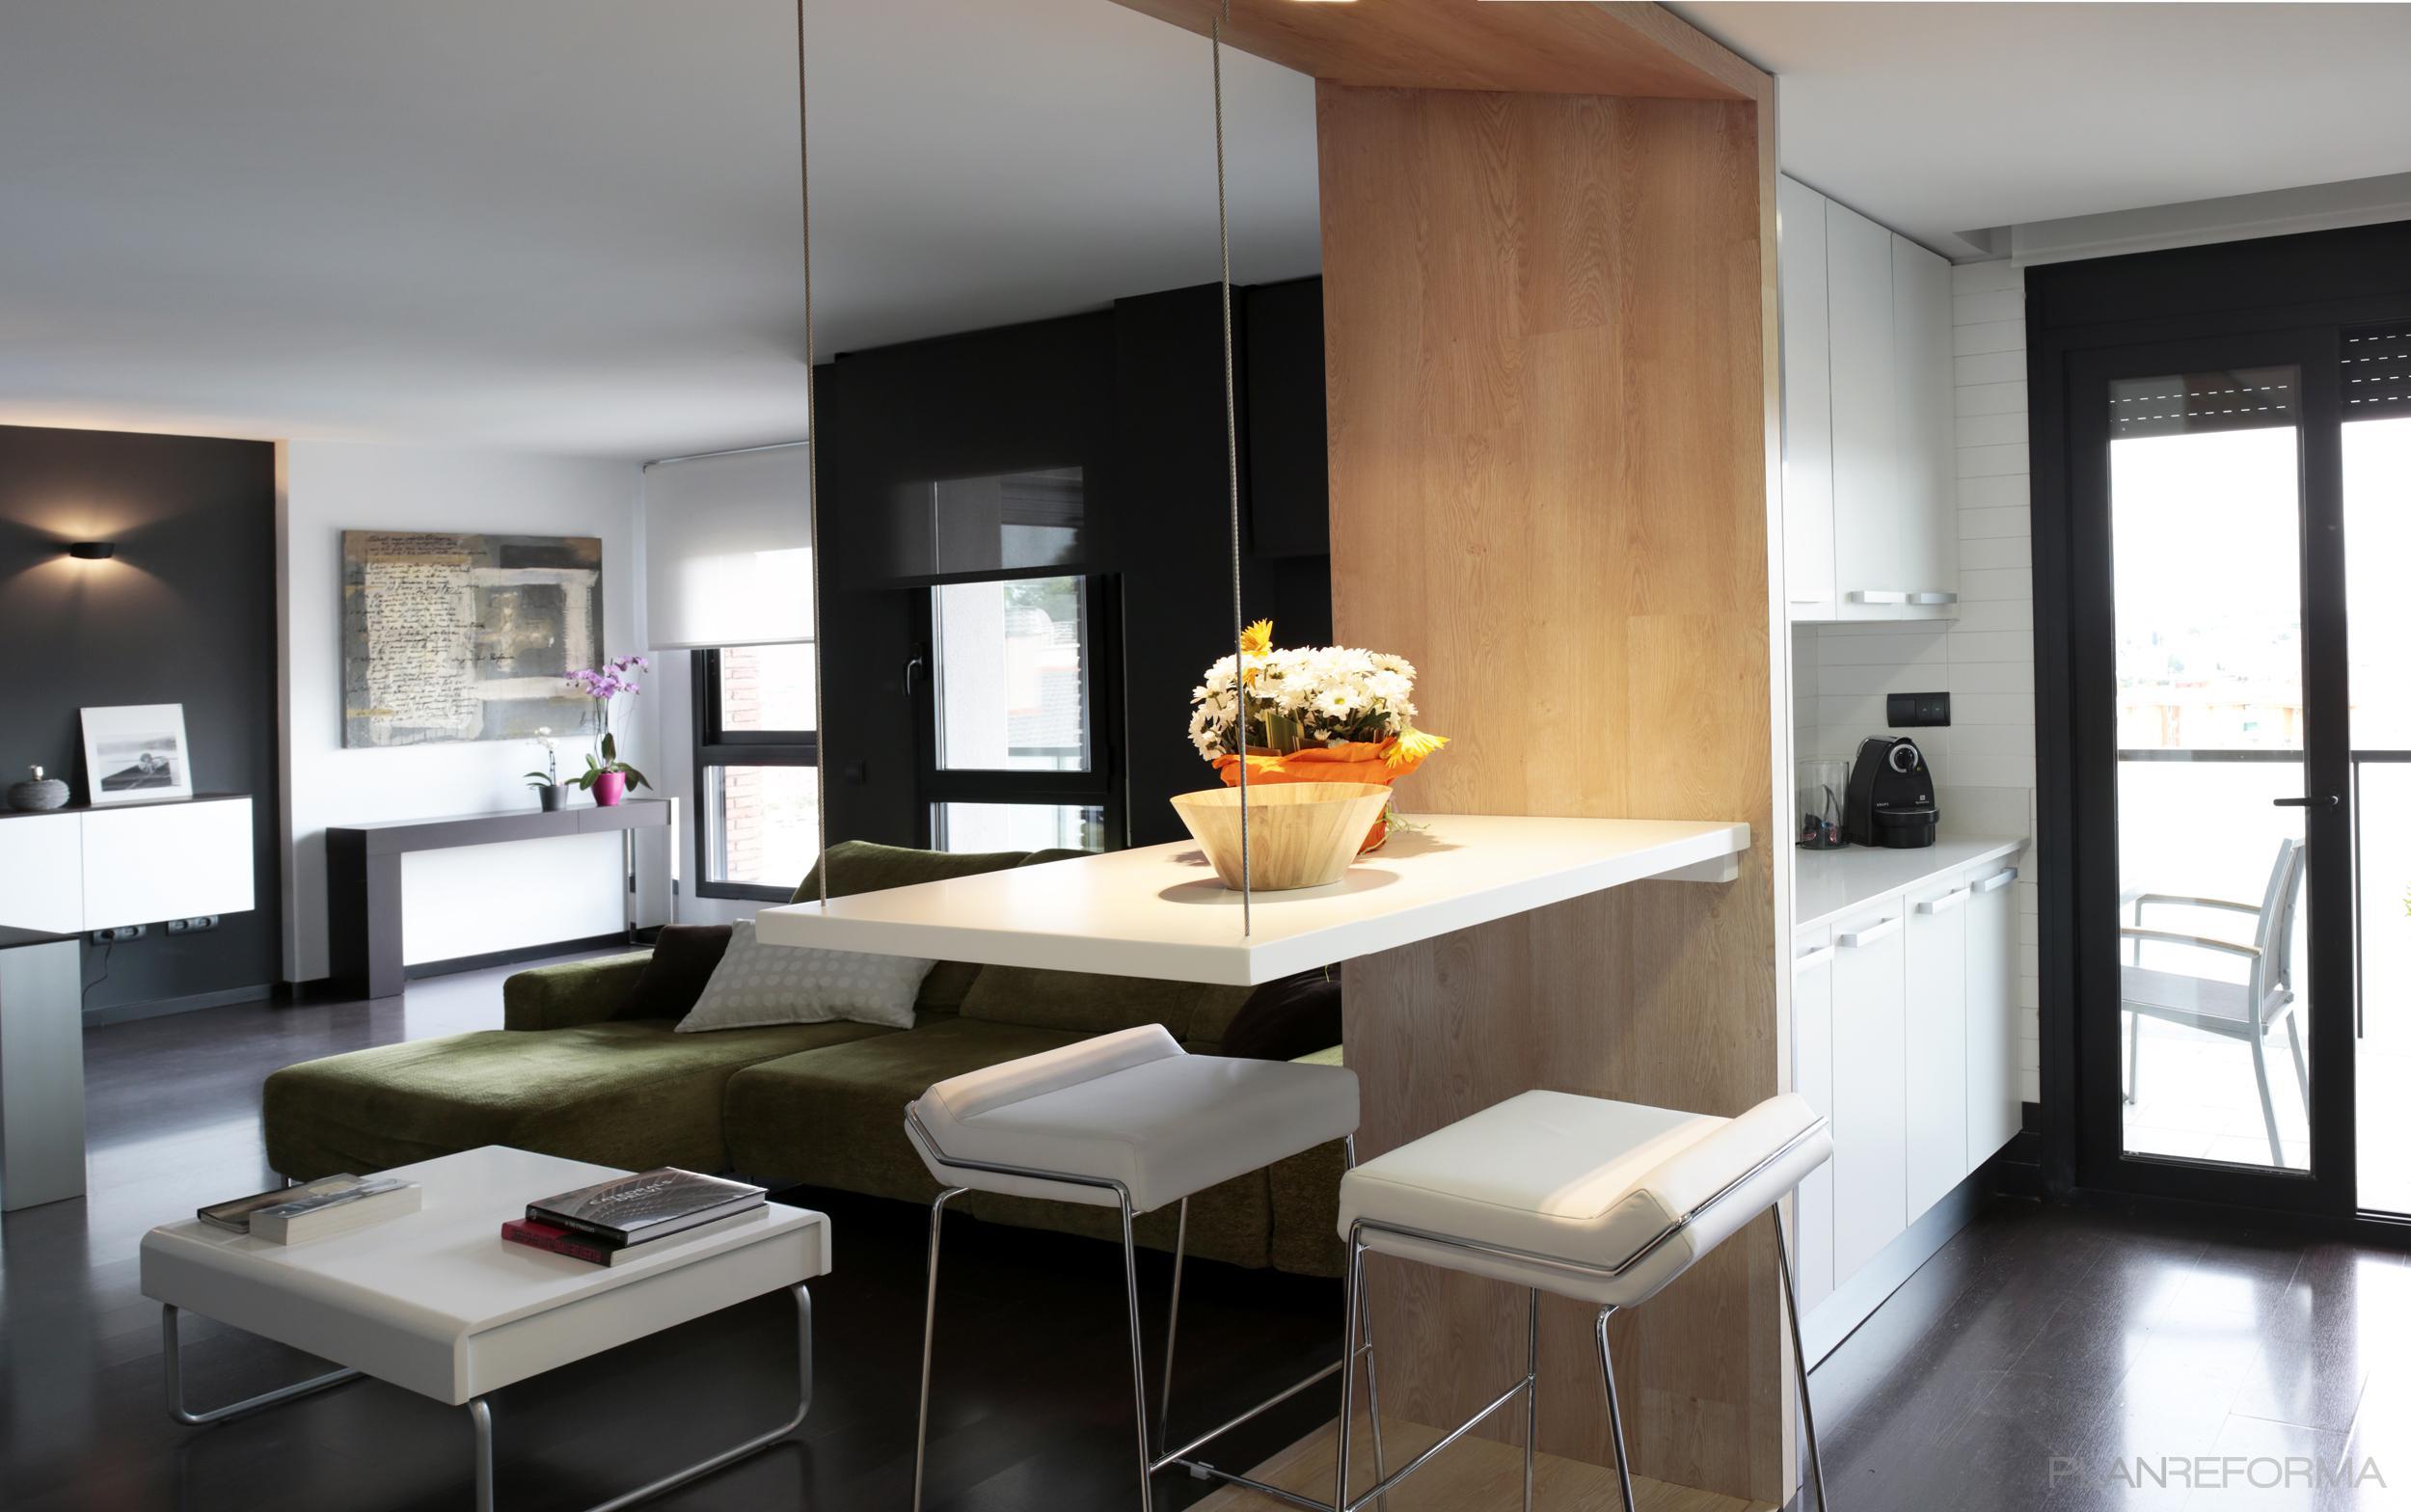 Comedor cocina style contemporaneo color marron blanco gris - Cocina comedor ideas ...